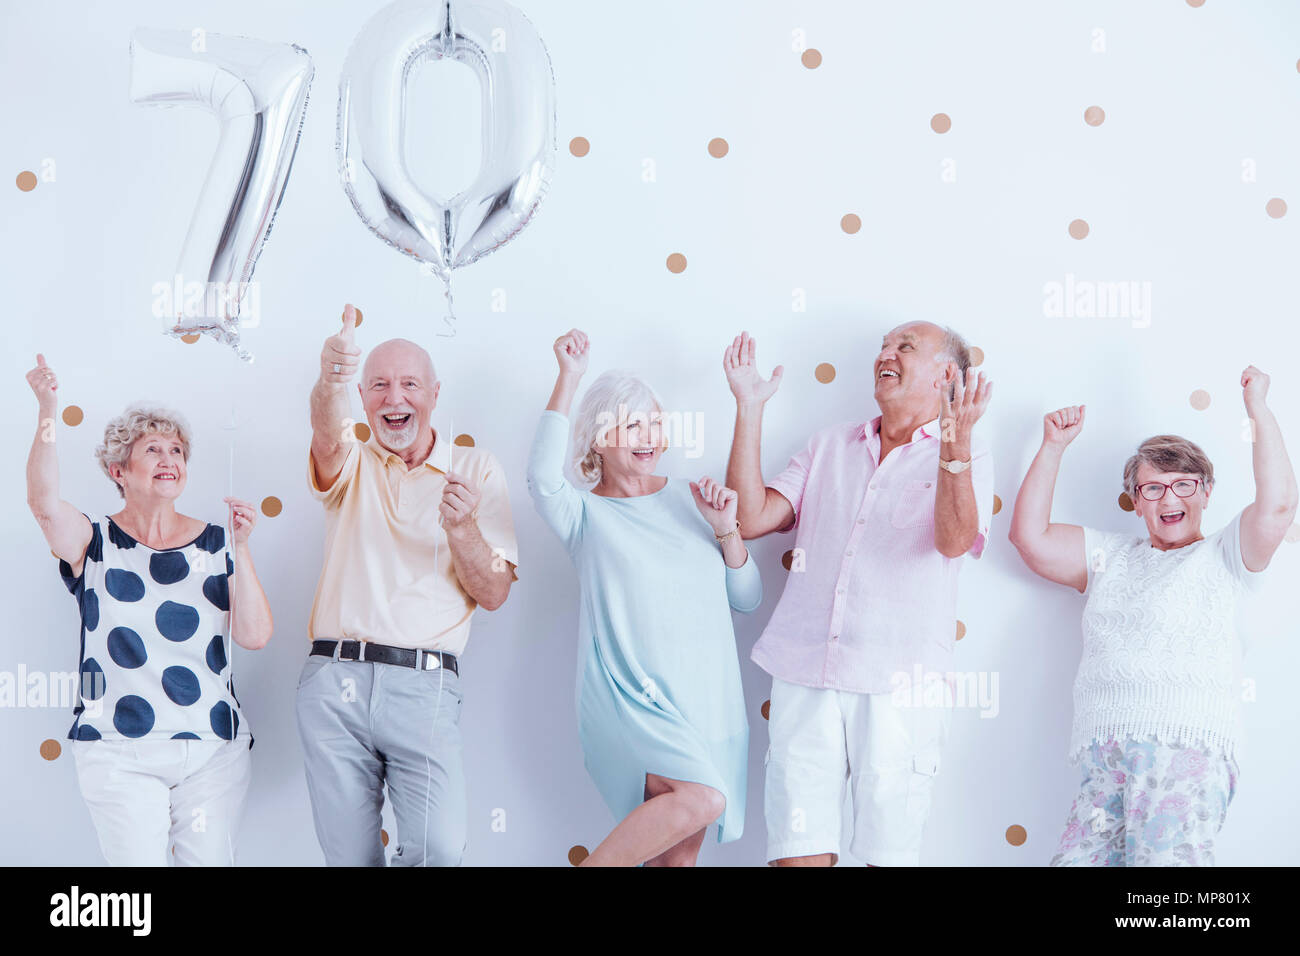 Positive seniors family celebrating grandfather's birthday with silver balloons Stock Photo